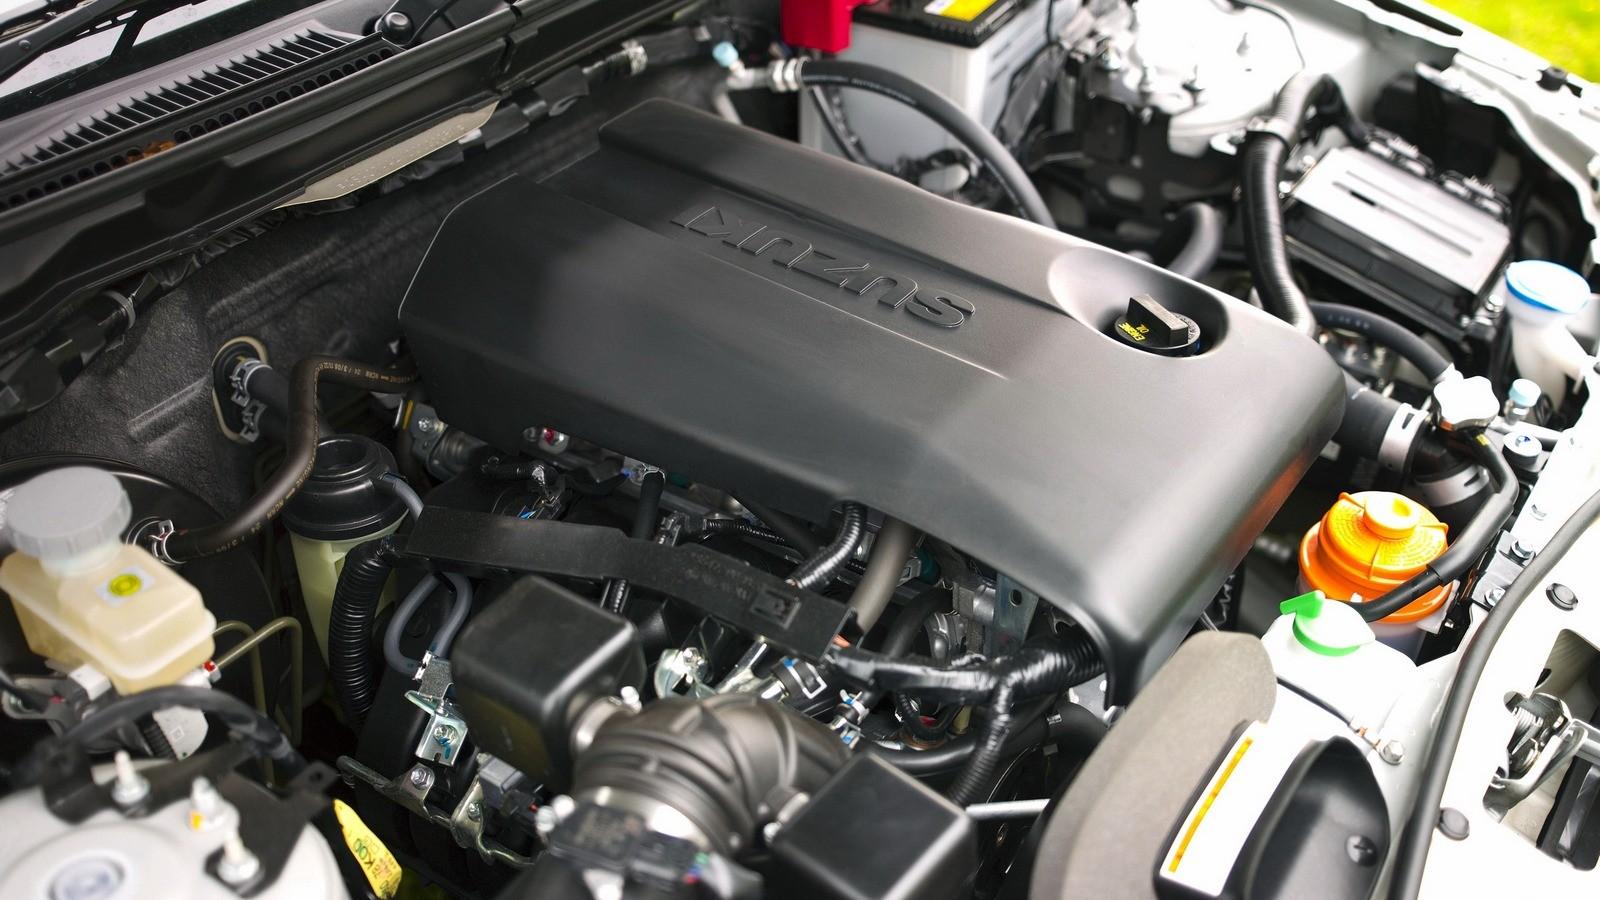 На фото: Под капотом Suzuki Grand Vitara 3-door